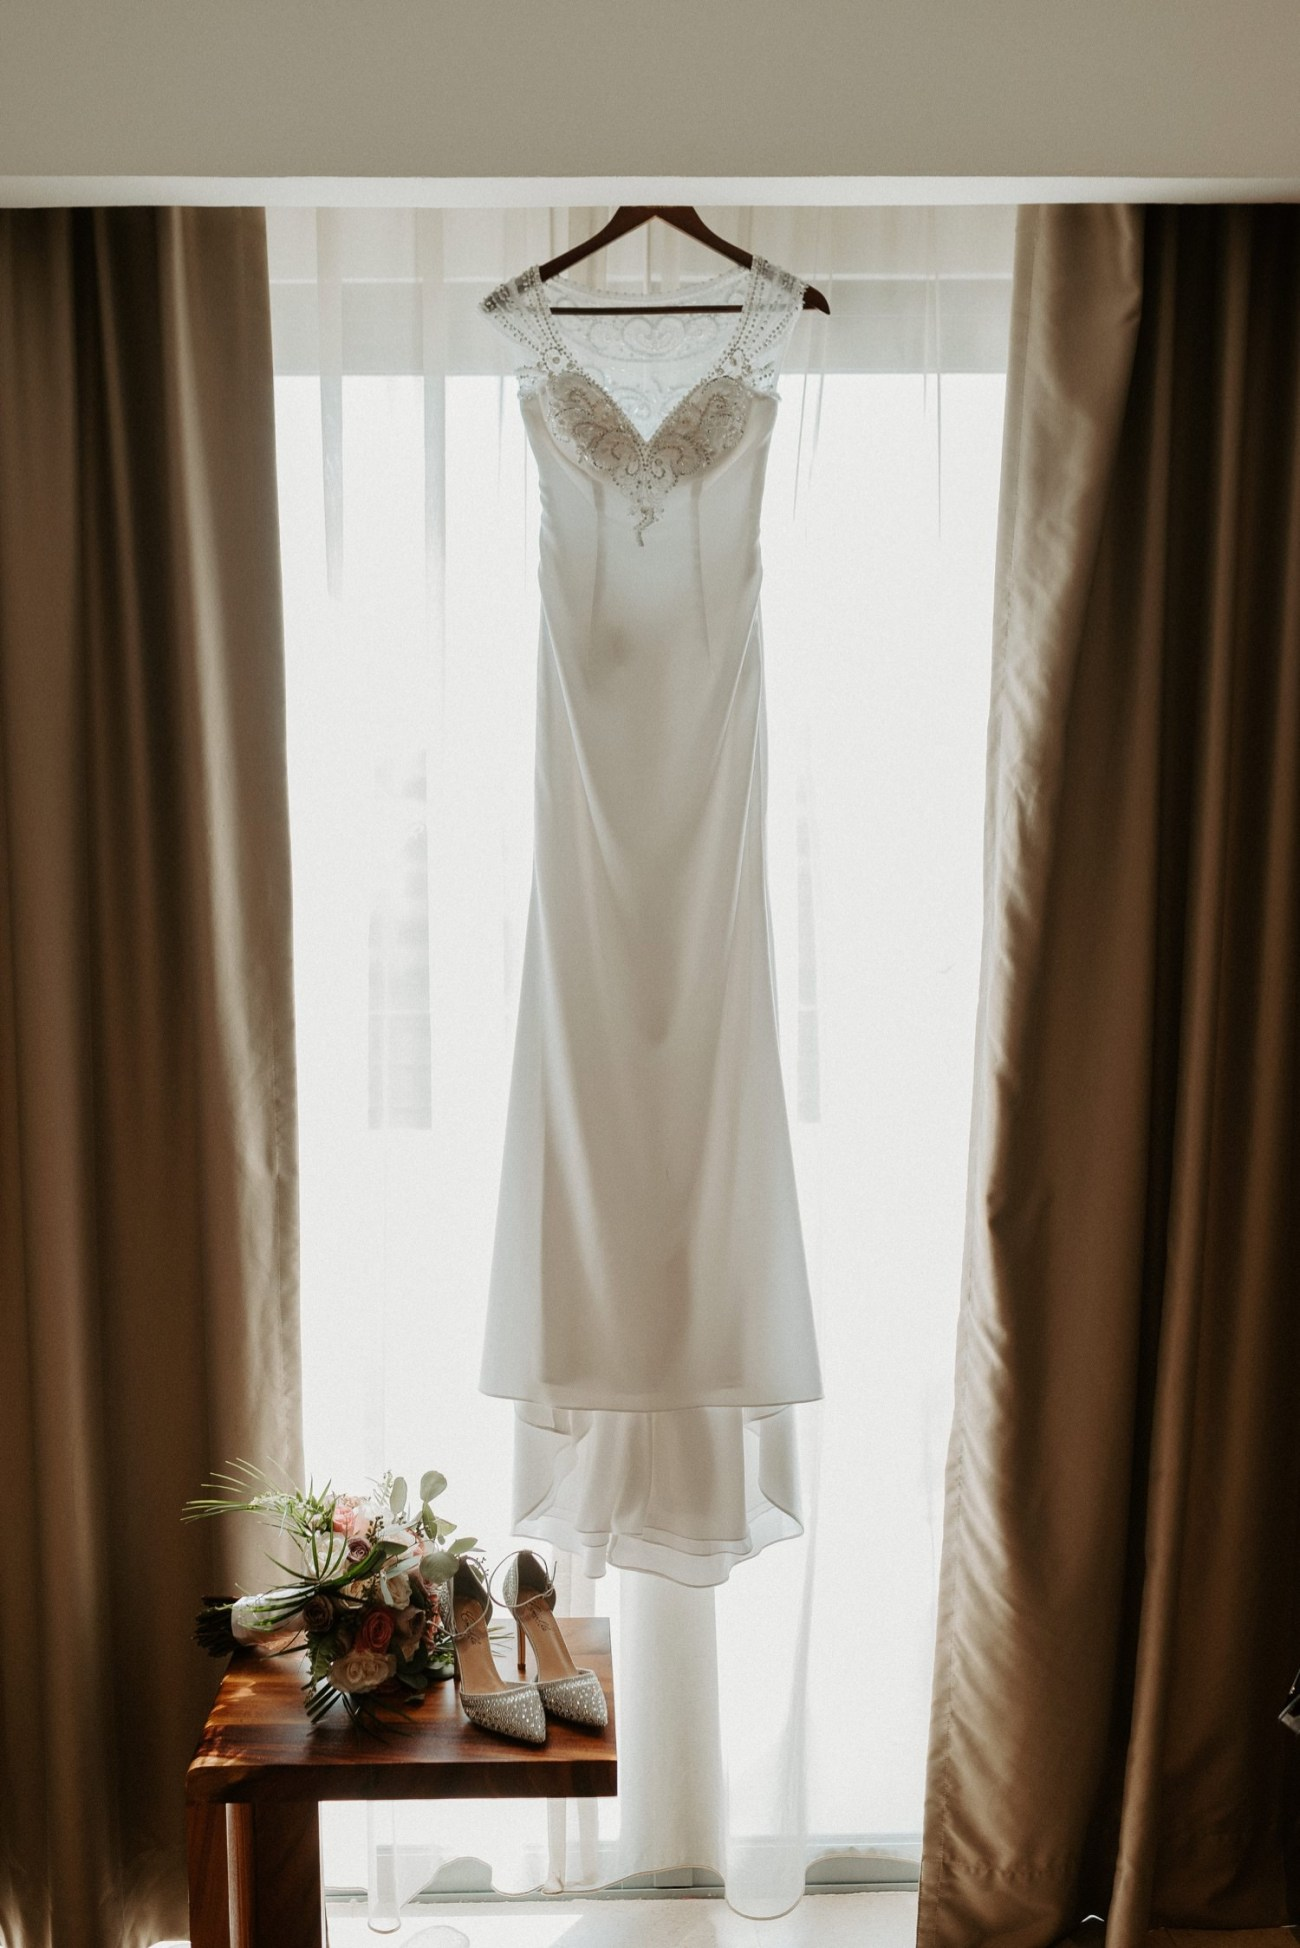 Cancun Destination Wedding Mexico Tulum Wedding Photographer Anais Possamai Photography 012